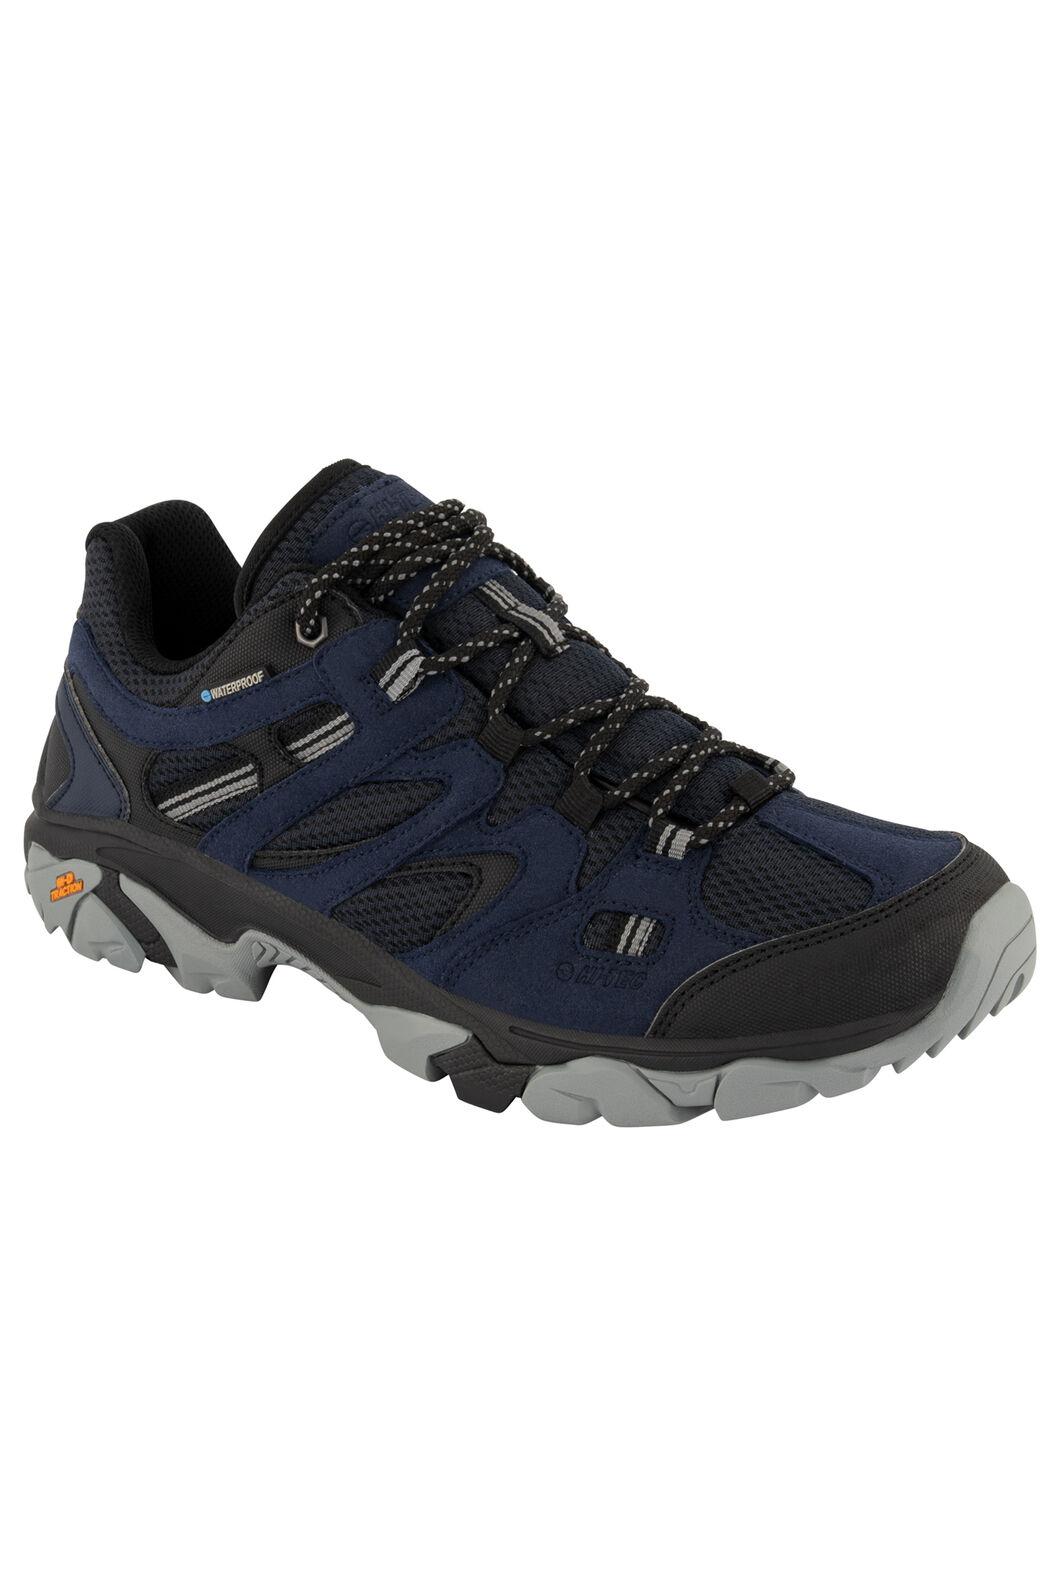 Hi-Tec Men's Ravus Vent Lite WP Low Hiking Shoes, Midnight/Black Monument, hi-res